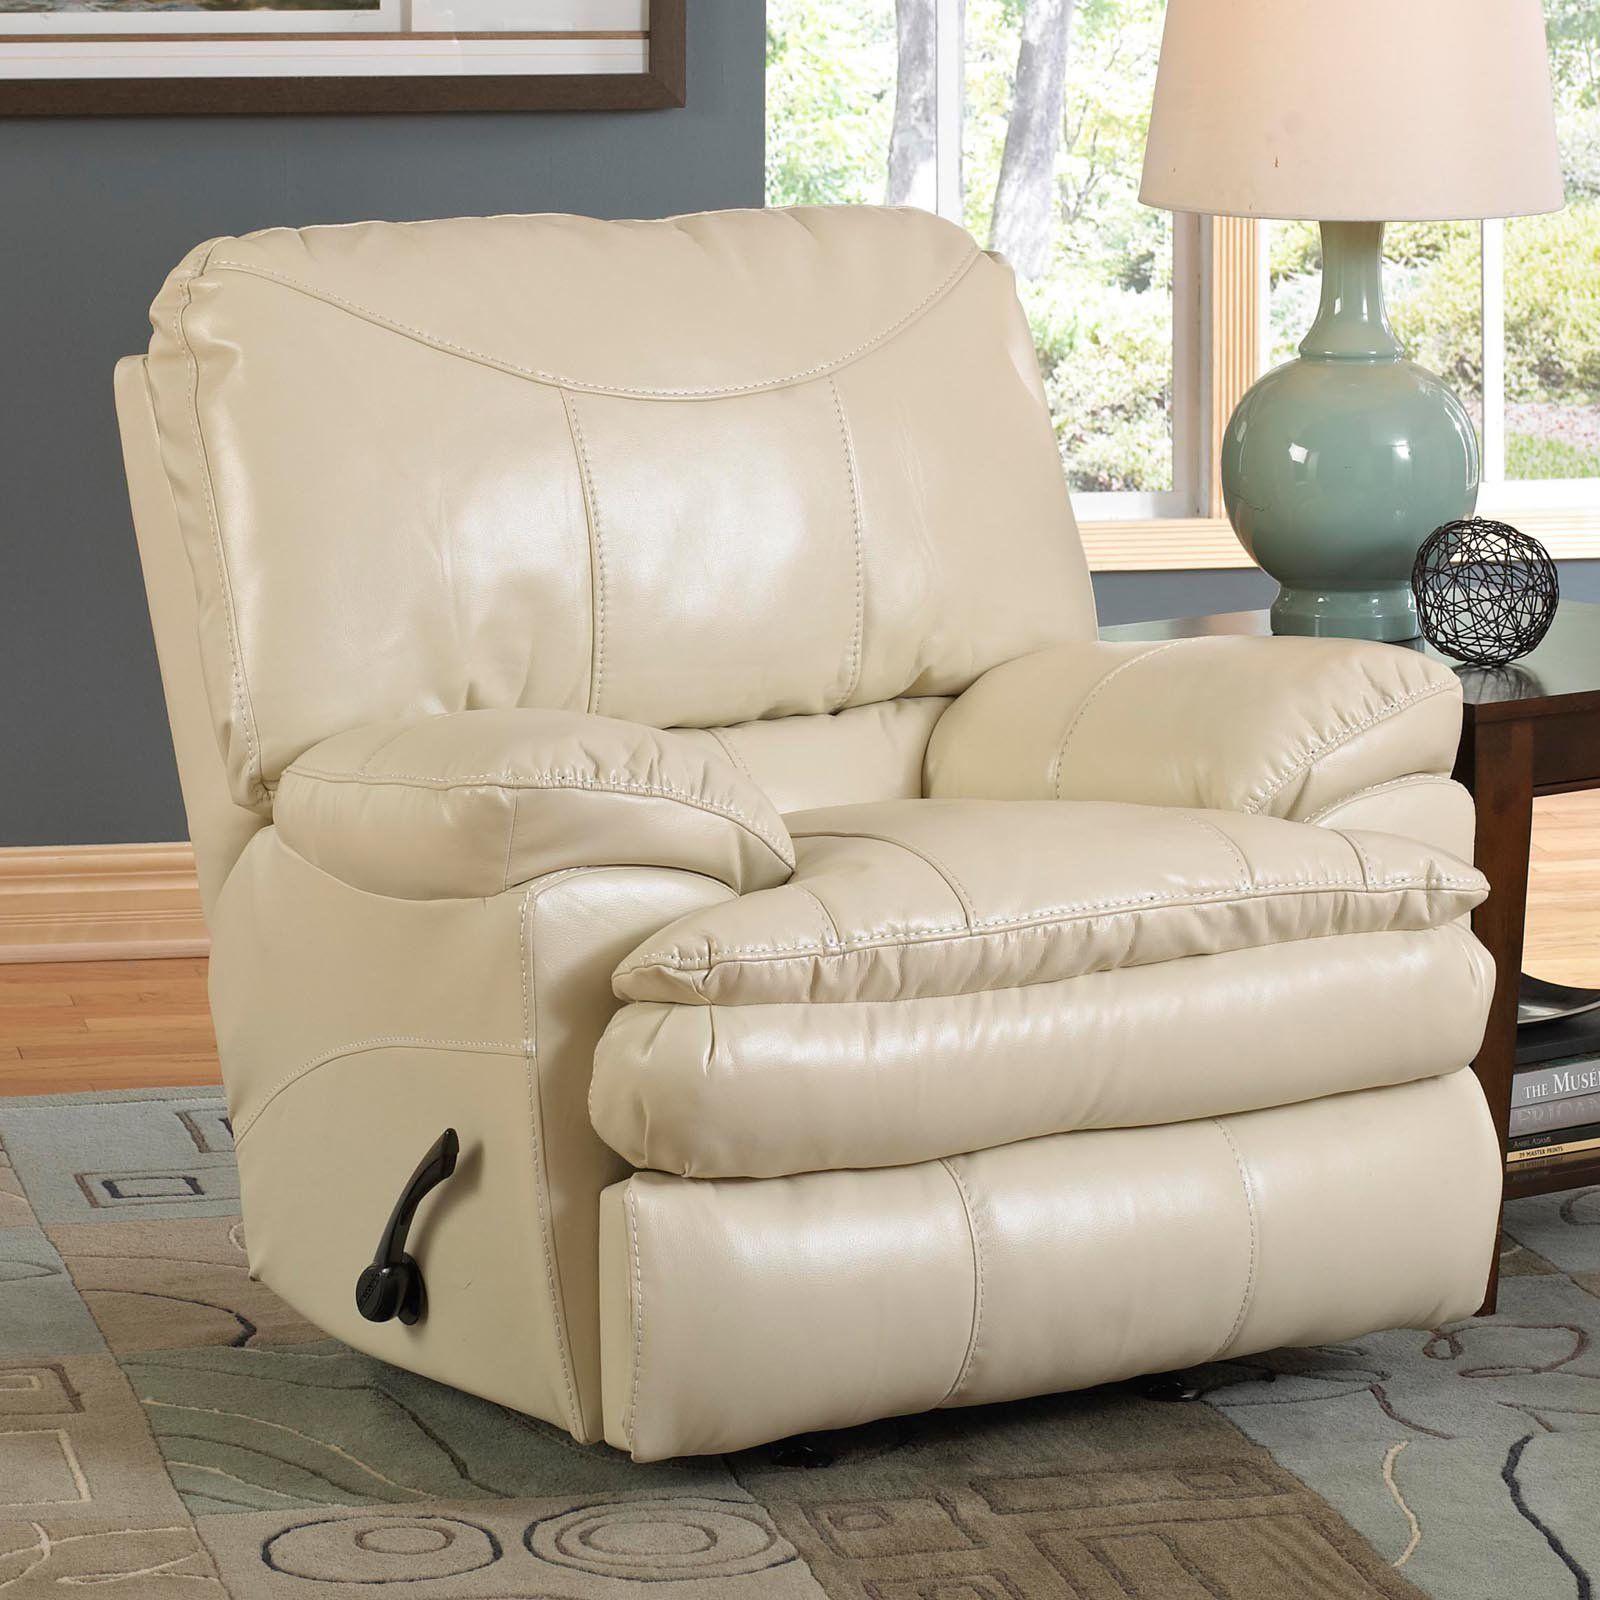 Astonishing Catnapper Perez Chaise Rocker Recliner 41402123328303328 Dailytribune Chair Design For Home Dailytribuneorg